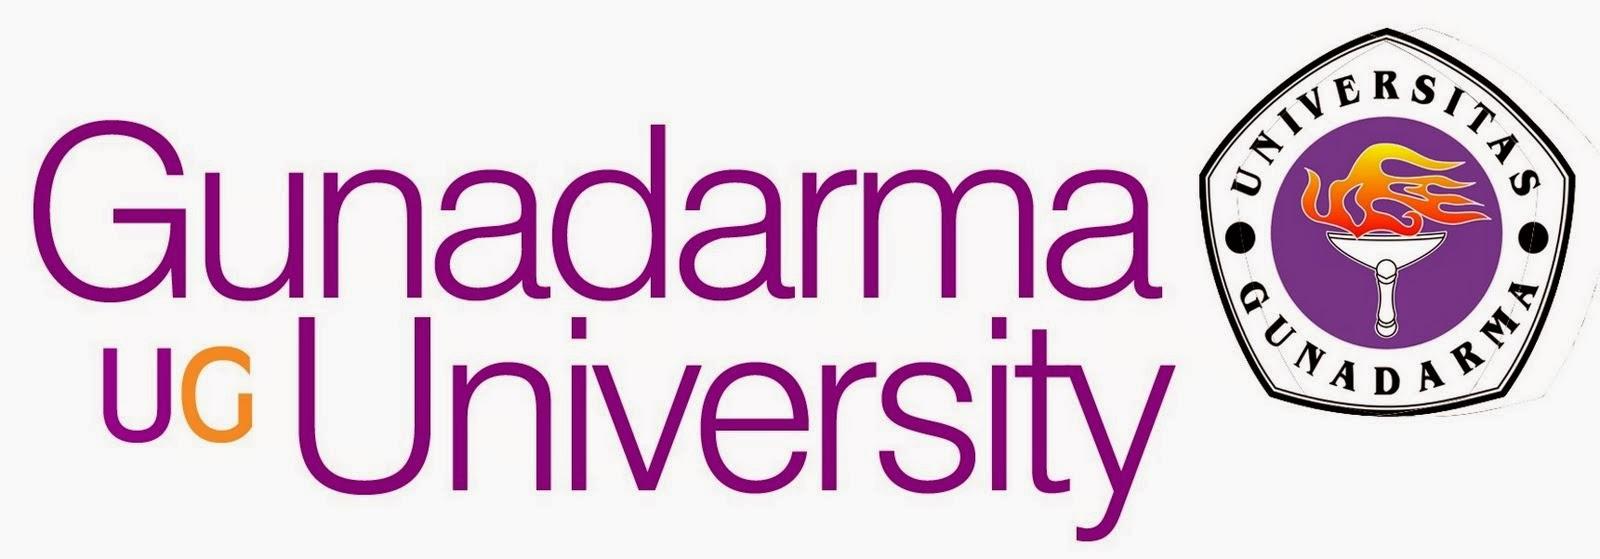 Link Baak Online Universitas Gunadarma